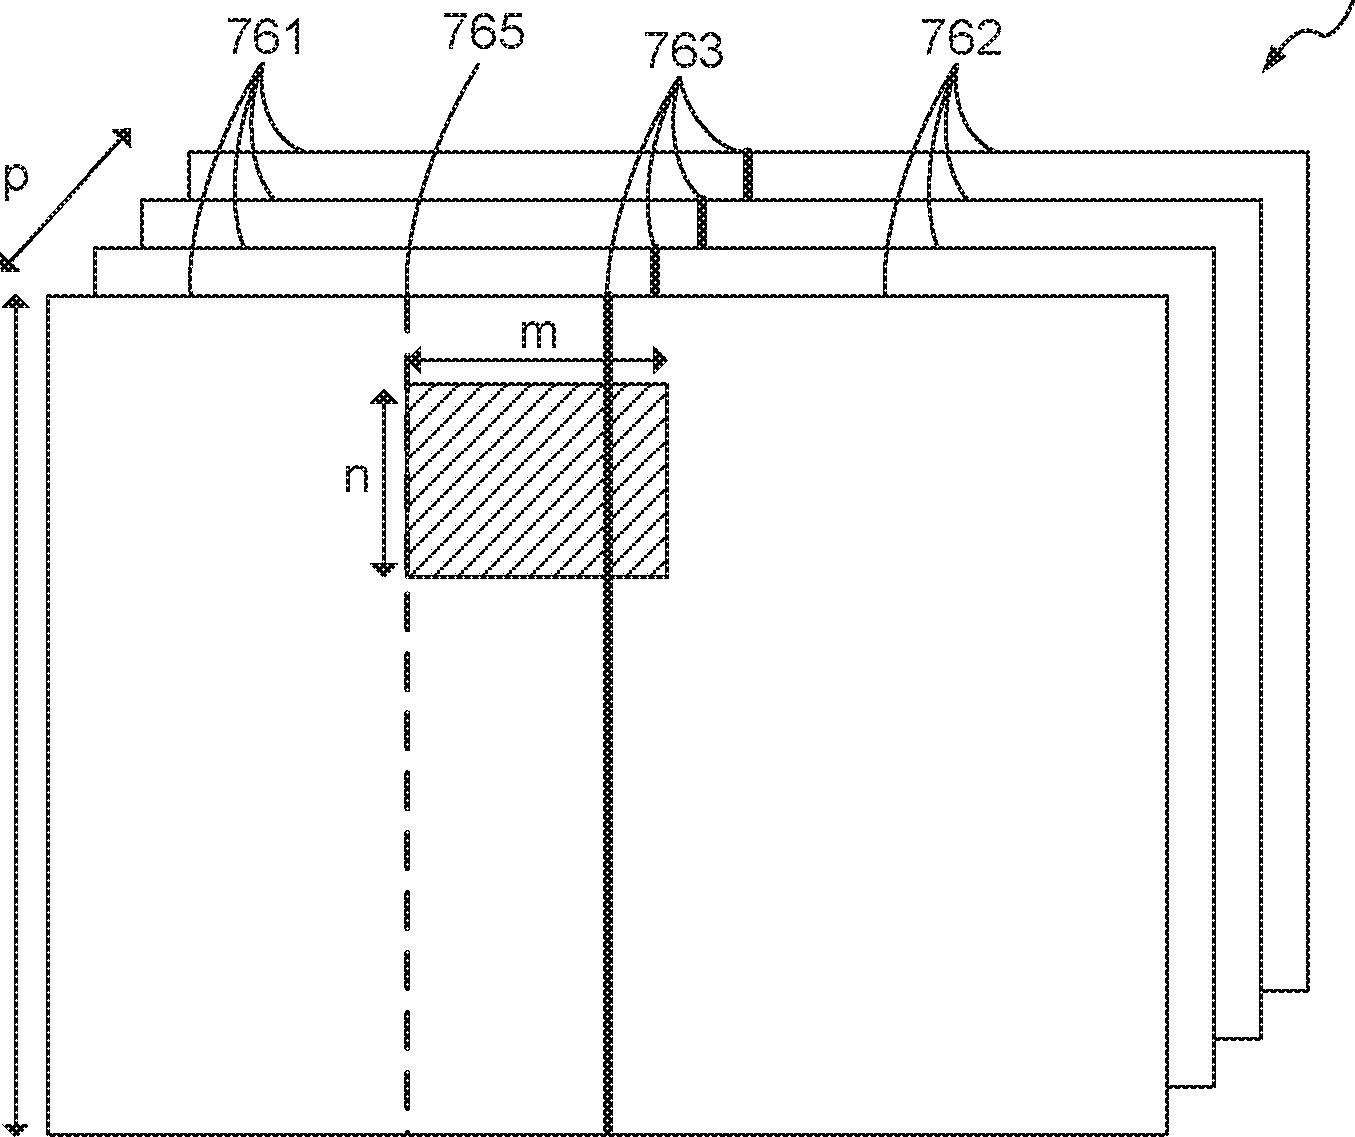 Figure GB2552242A_D0012